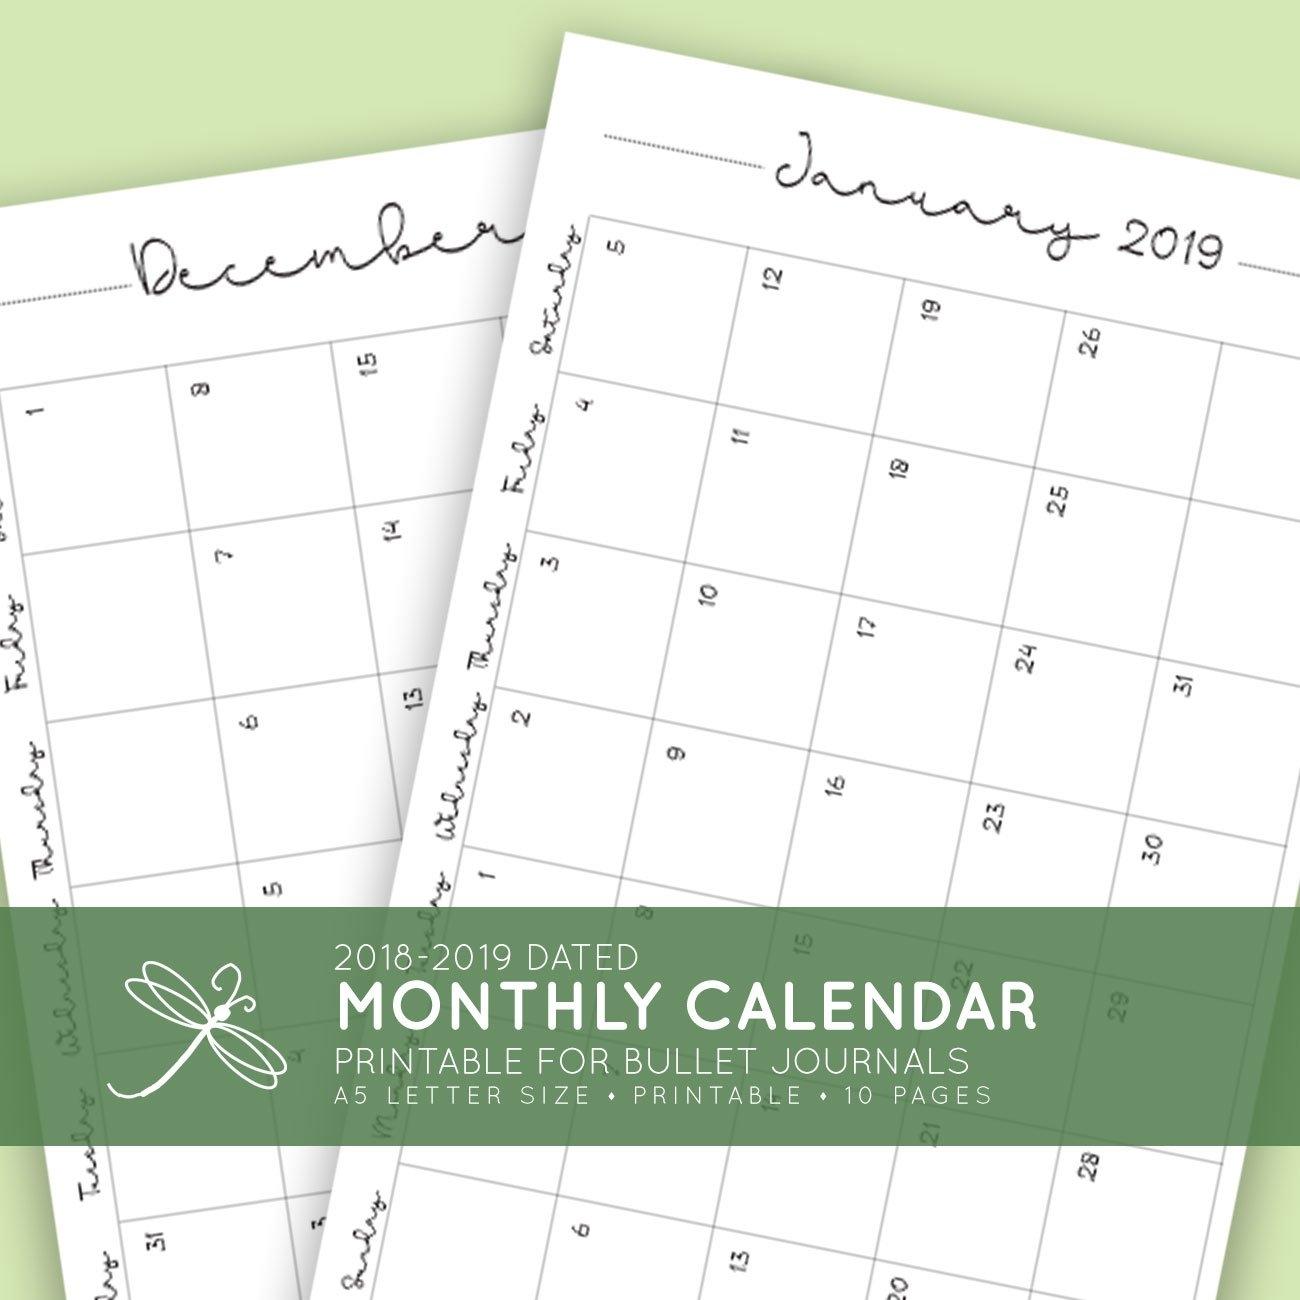 2018 + 2019 Monthly Printable Calendar | Laura Kinker - Designer 2019 Calendar 8.5 X 11 Printable